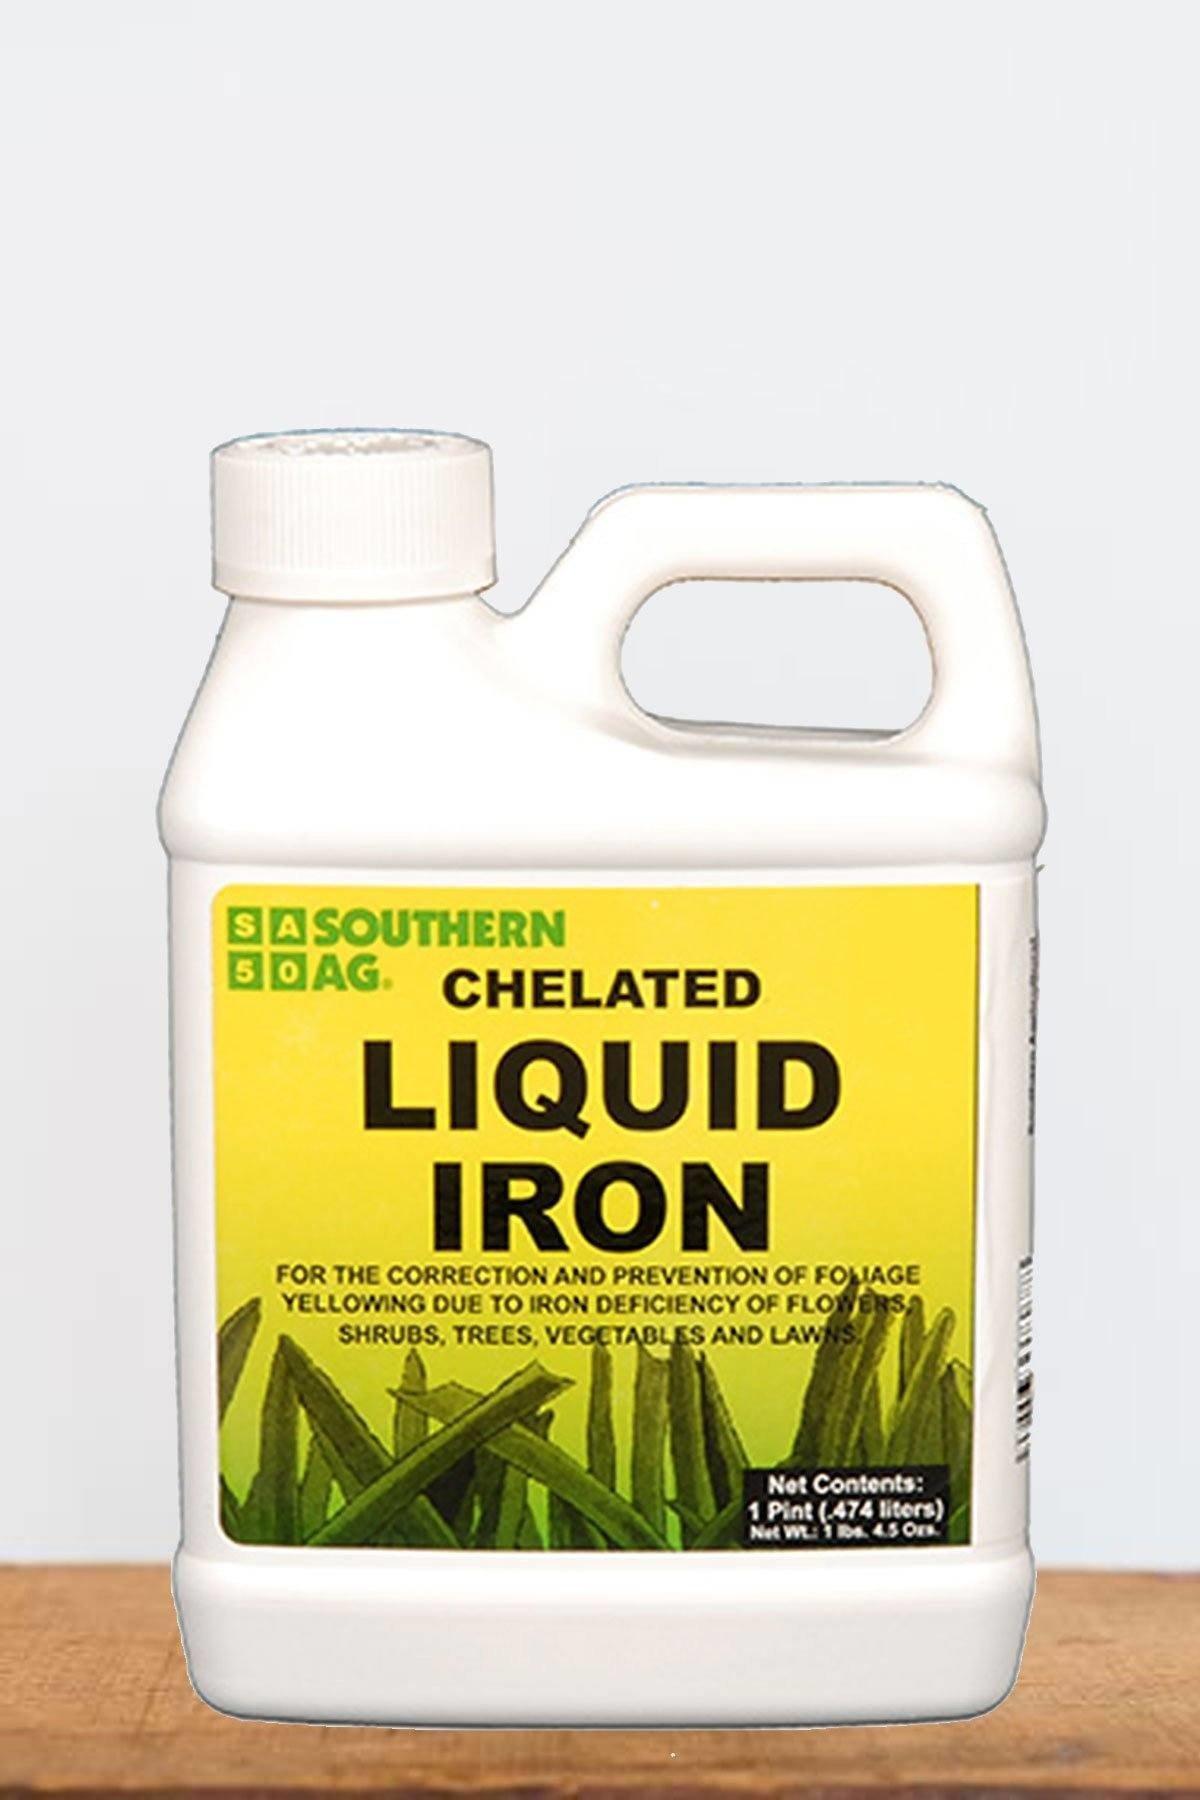 Southern Ag Chelated Liquid Iron (Deficiency: Flower, Vegetable, Shrub, Tree, Lawn), 16 oz